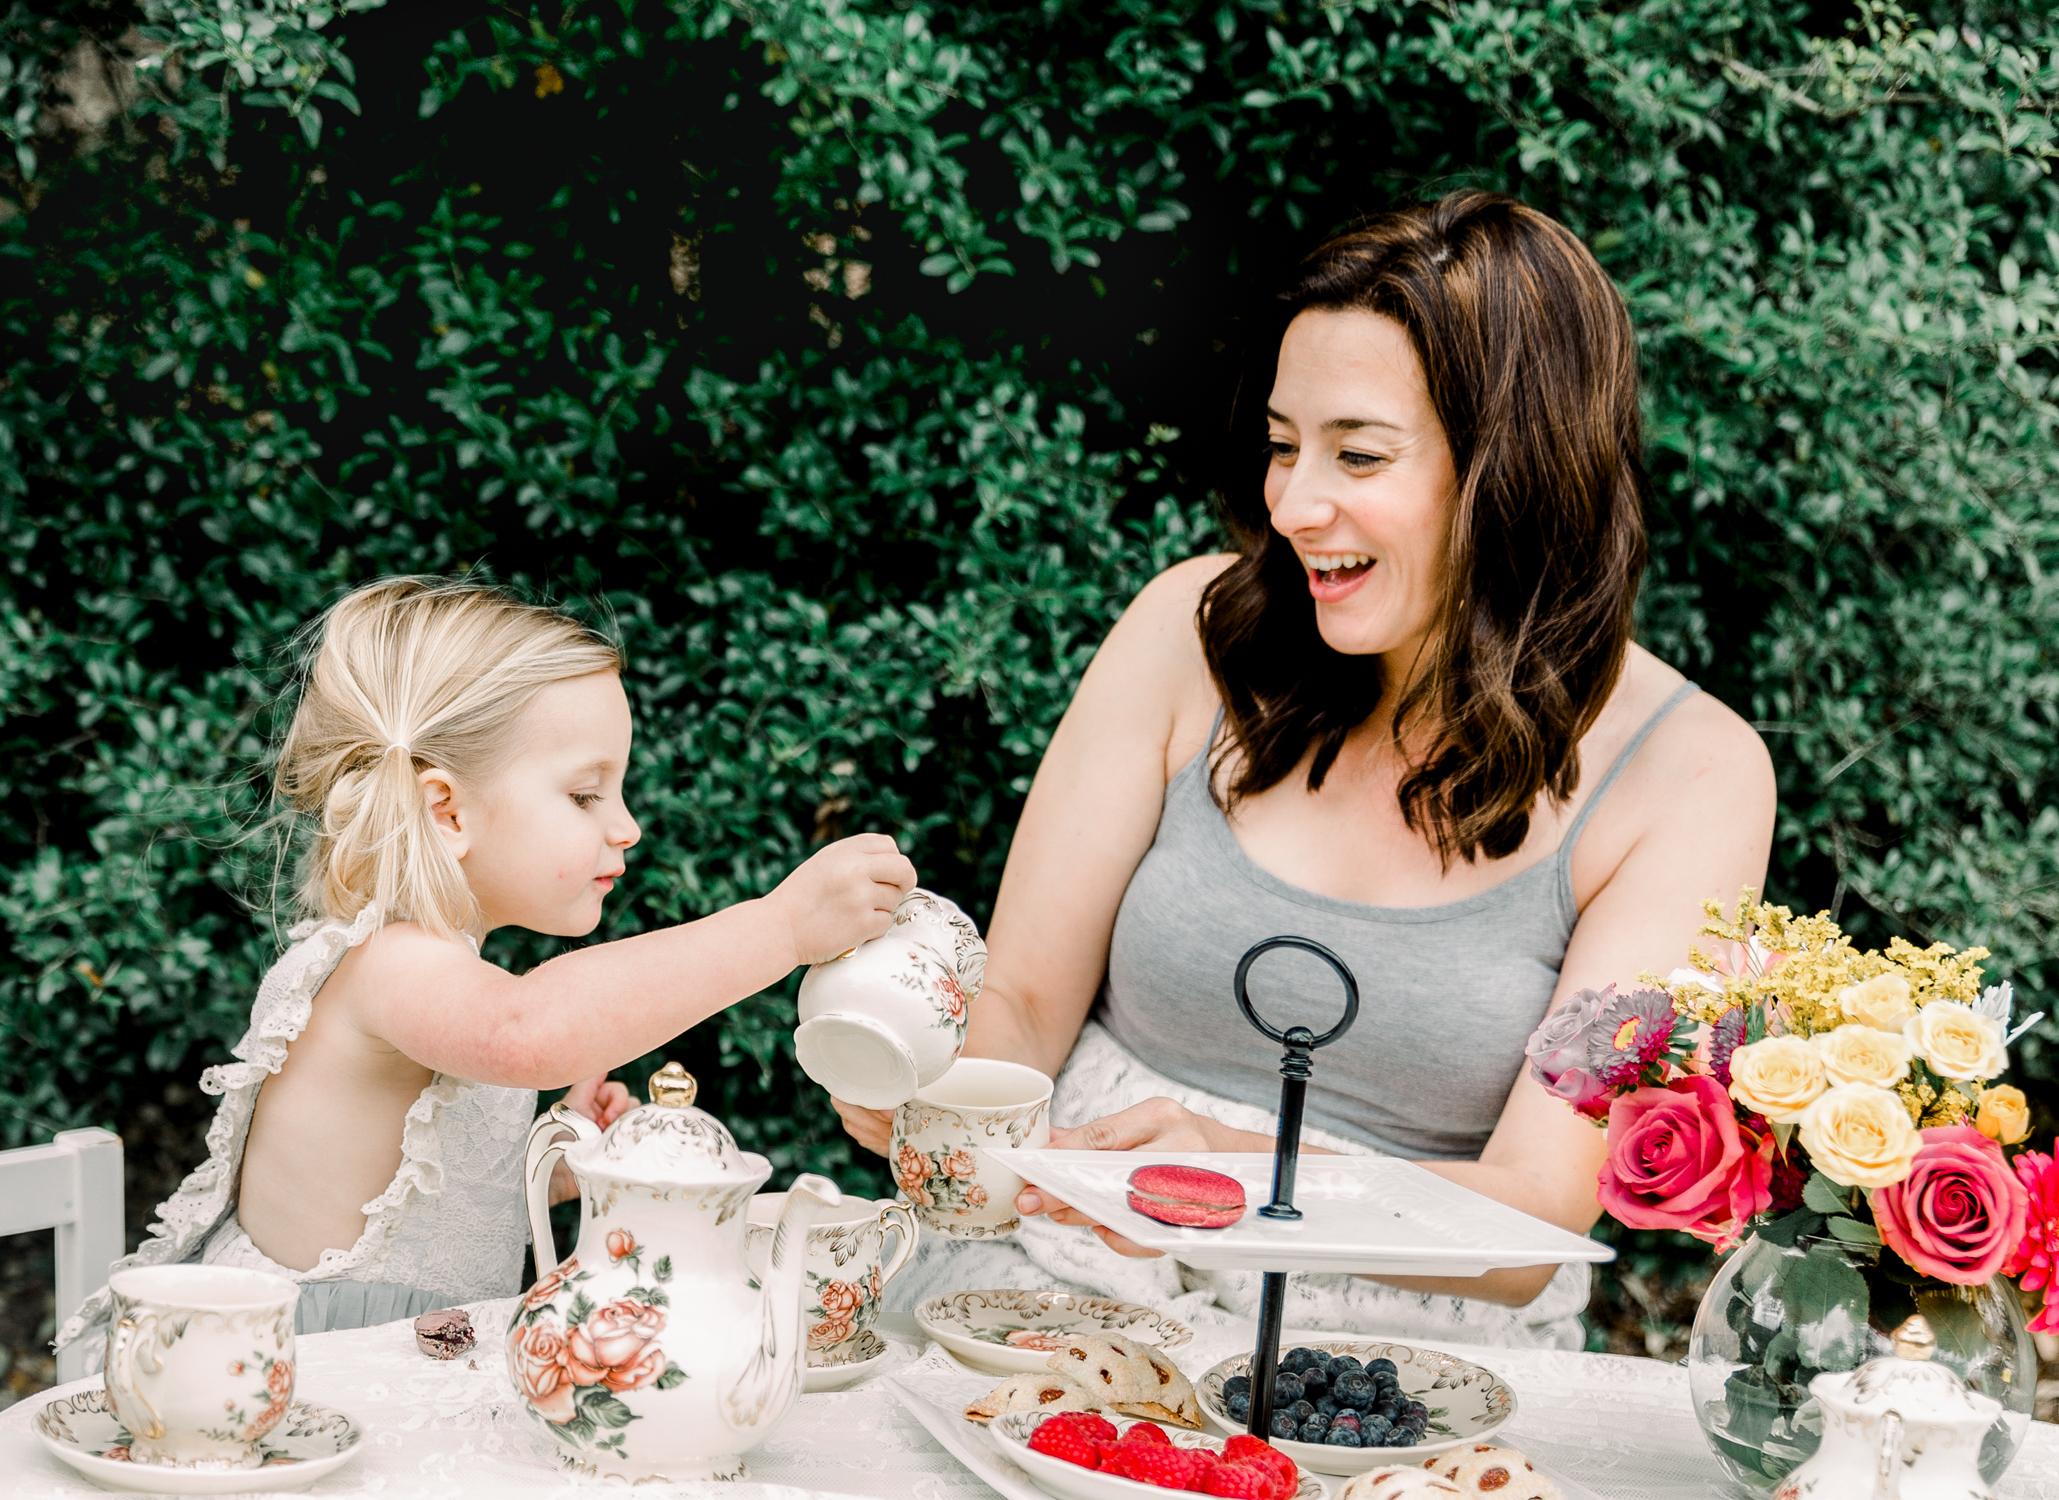 lifestyle-family-photographer-franklin-tea-time-4.jpg